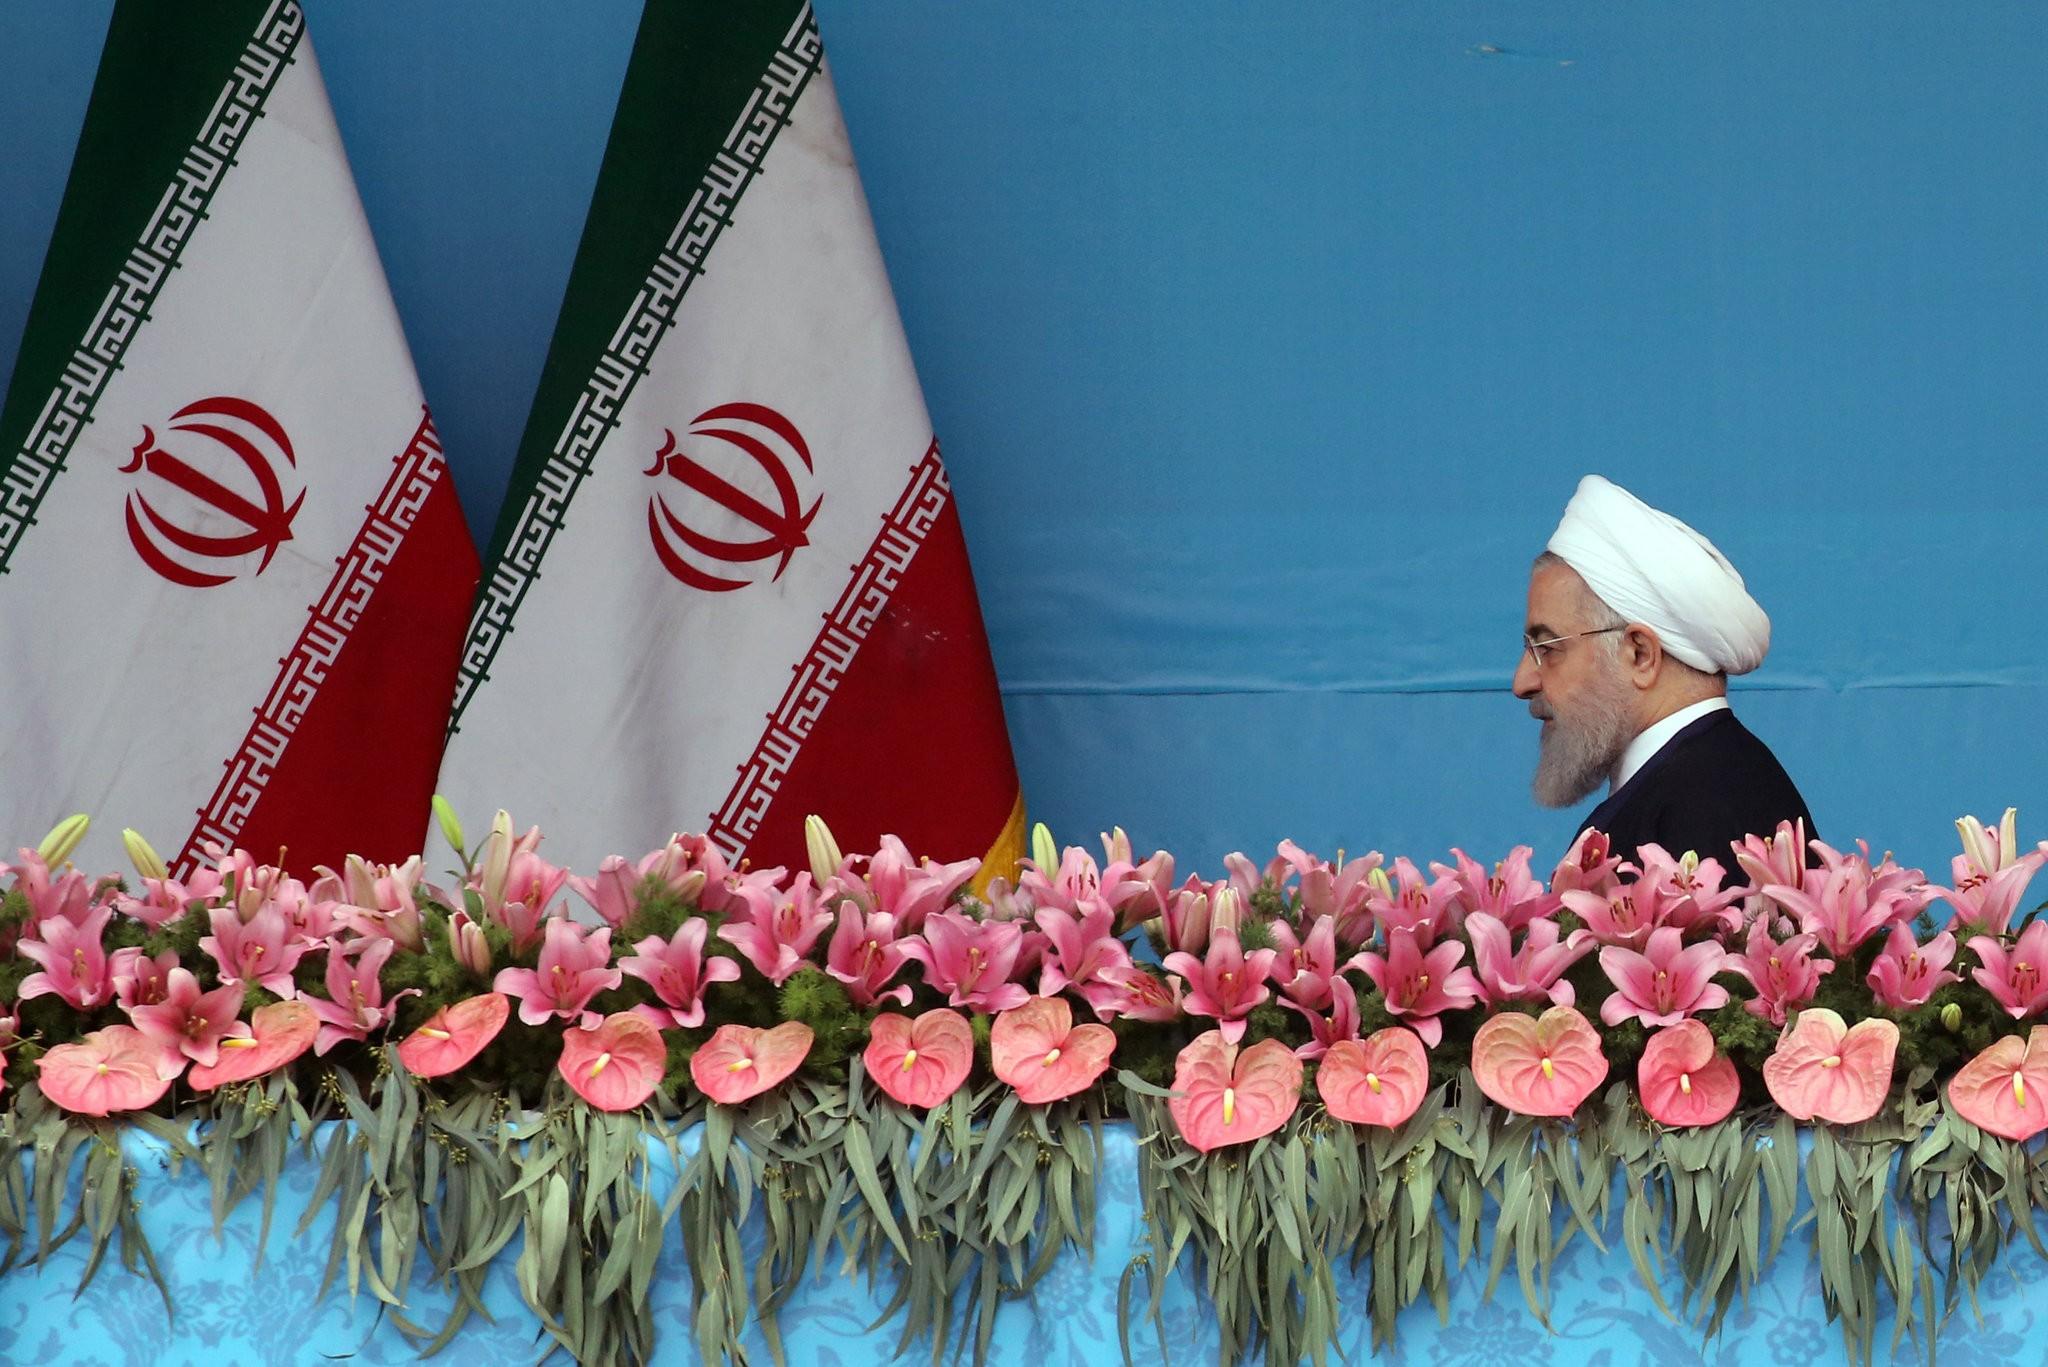 President Hassan Rouhani of Iran has been under pressure to retaliate against the United States. Credit Abedin Taherkenareh/EPA, via Shutterstock